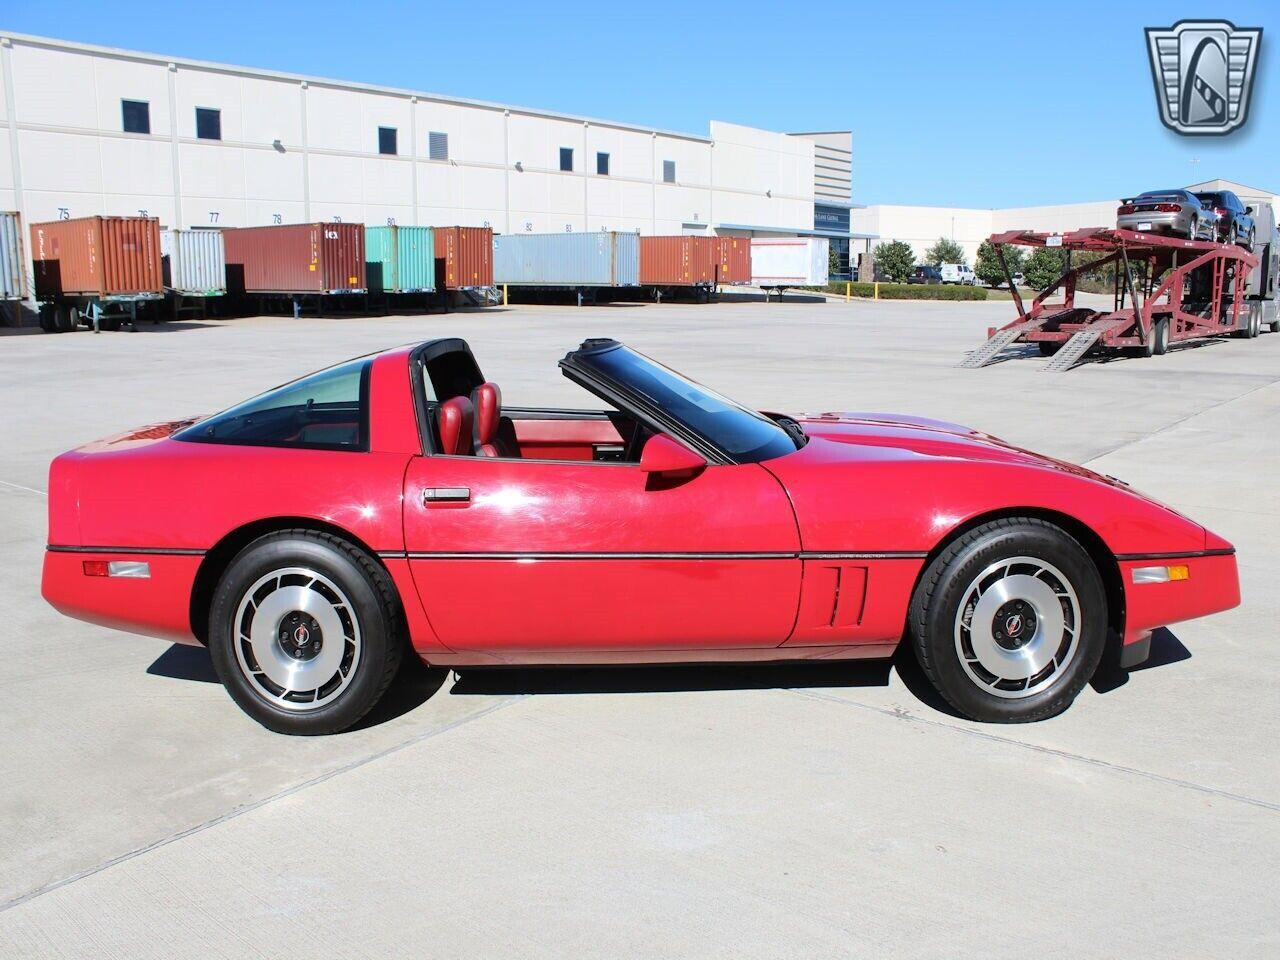 1984 Red Chevrolet Corvette     C4 Corvette Photo 6